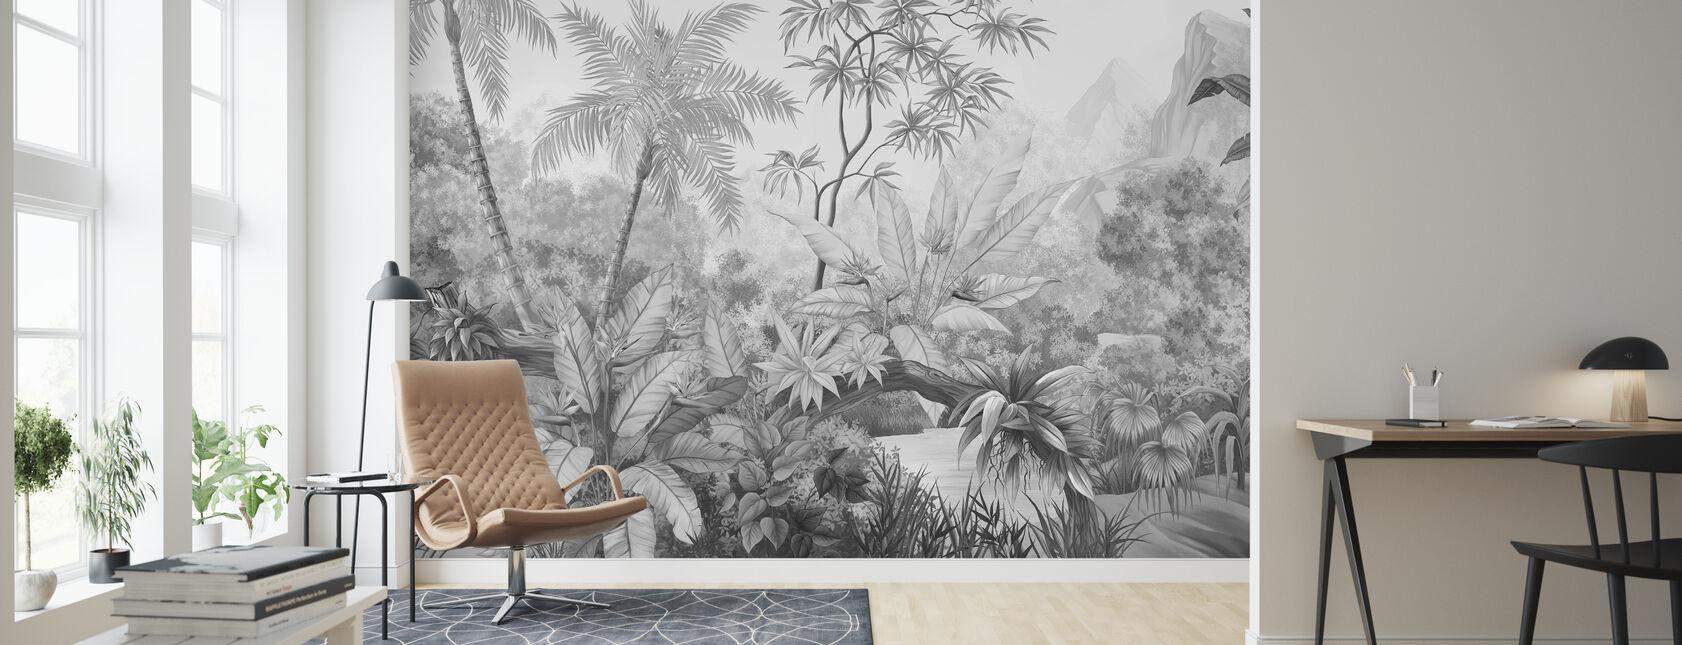 Verward Jungle - Bw - Behang - Woonkamer